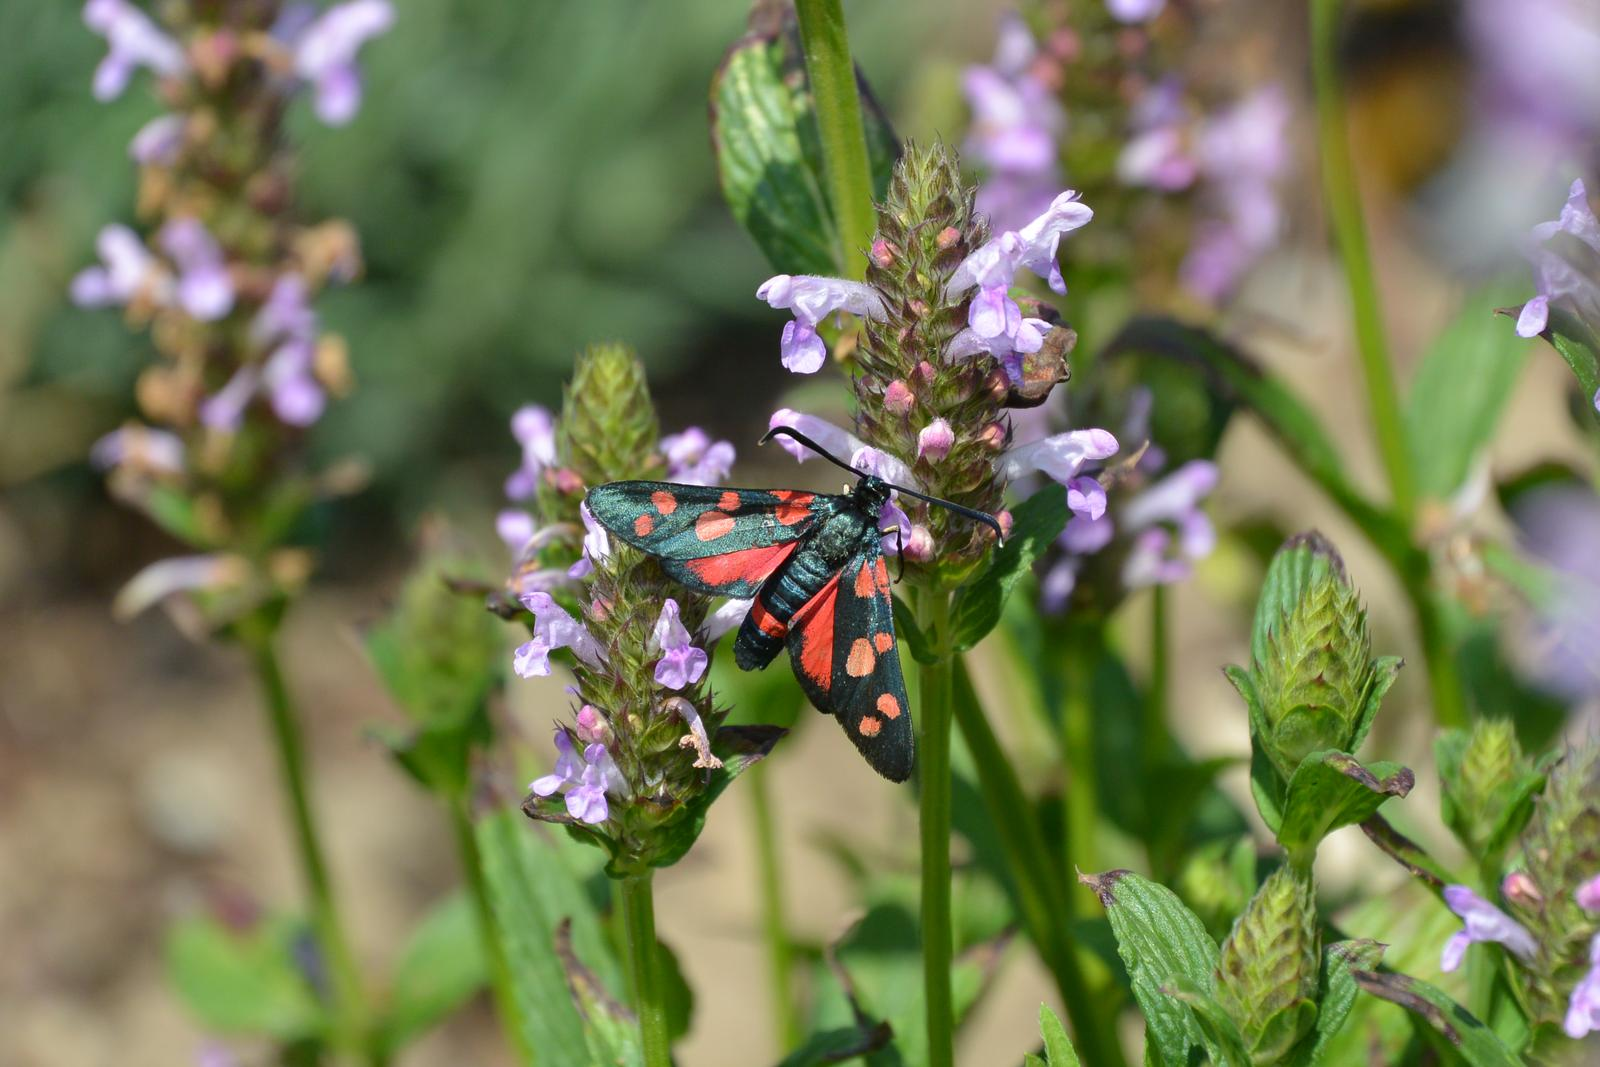 Motýlí zahrada 2019-2020 - Toto je asi Vřetenuška obecná